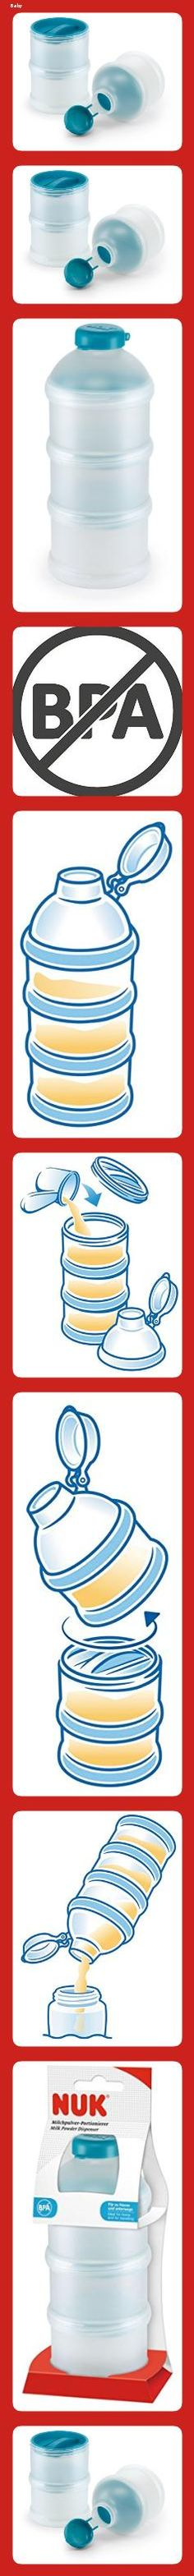 NUK Milchpulver-Portionierer BPA-Frei 3 StüCk Petrol Farbe Baby Babyflashen